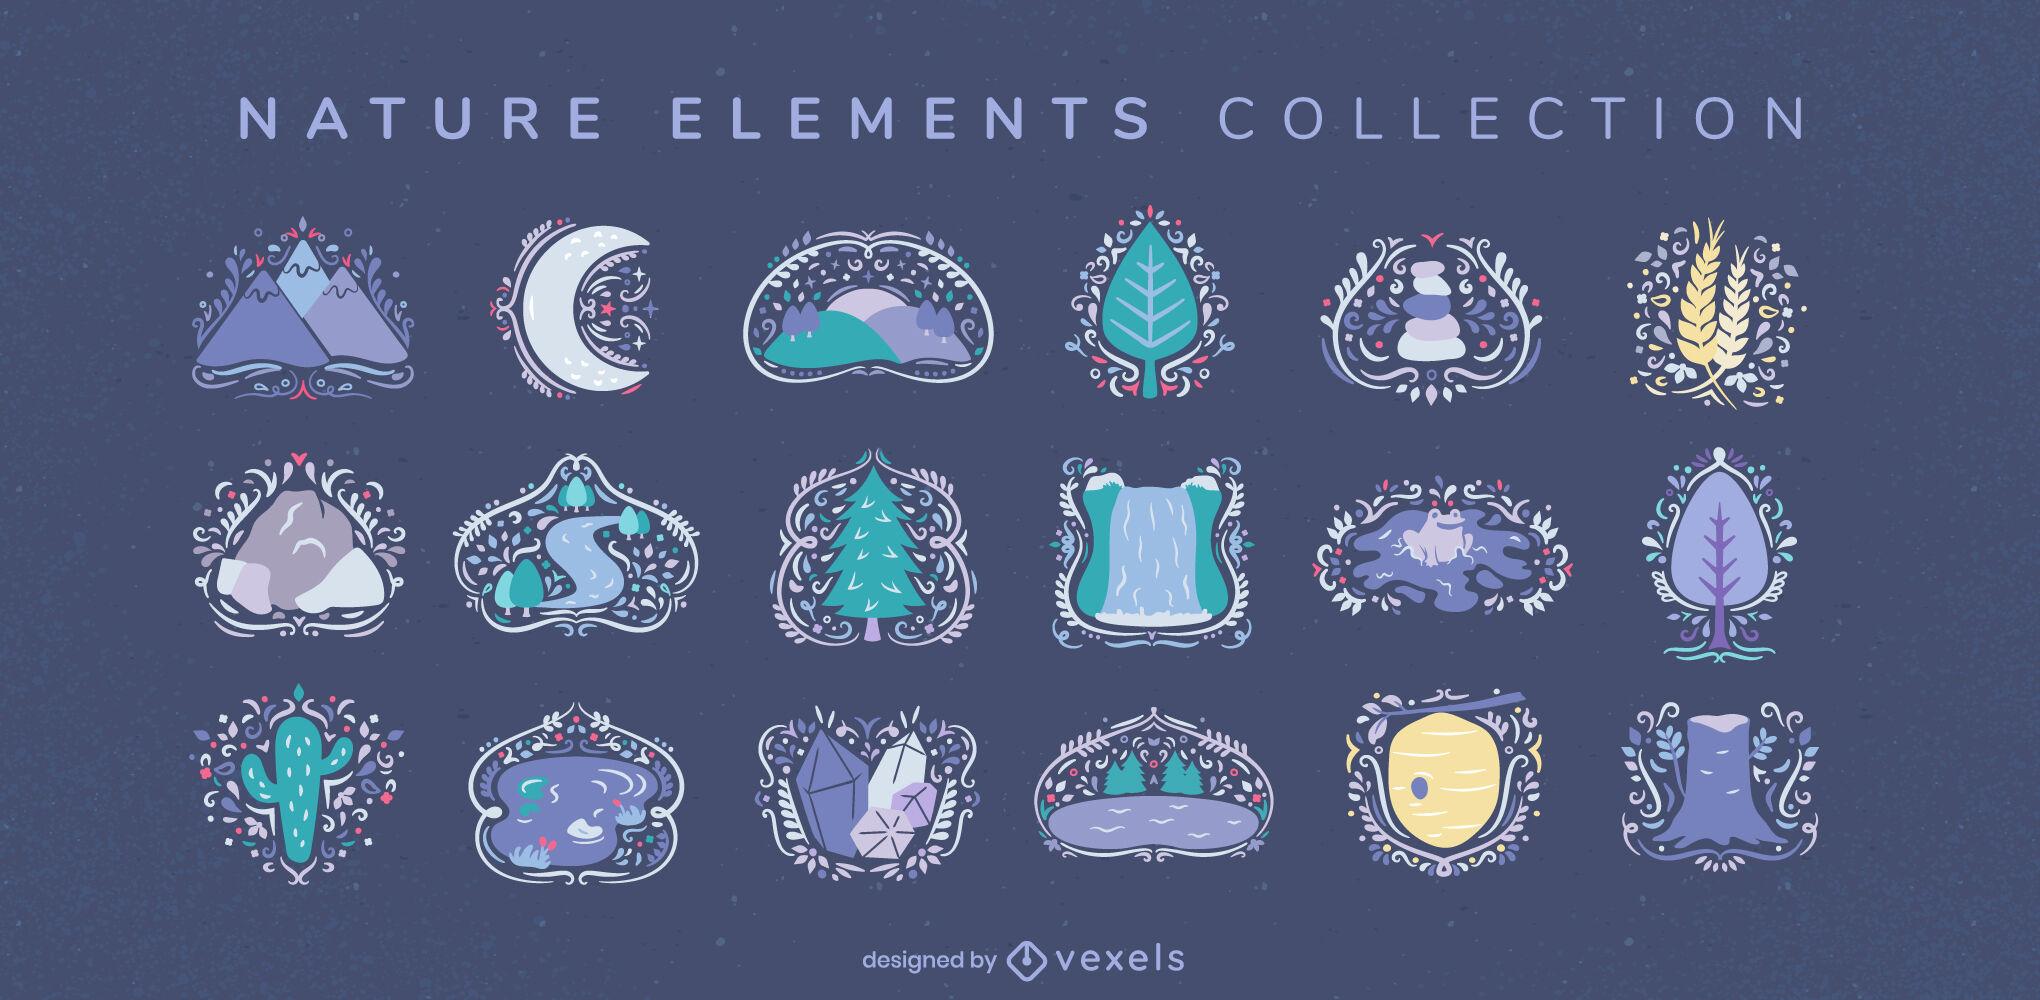 Colecci?n swirly de elementos naturales